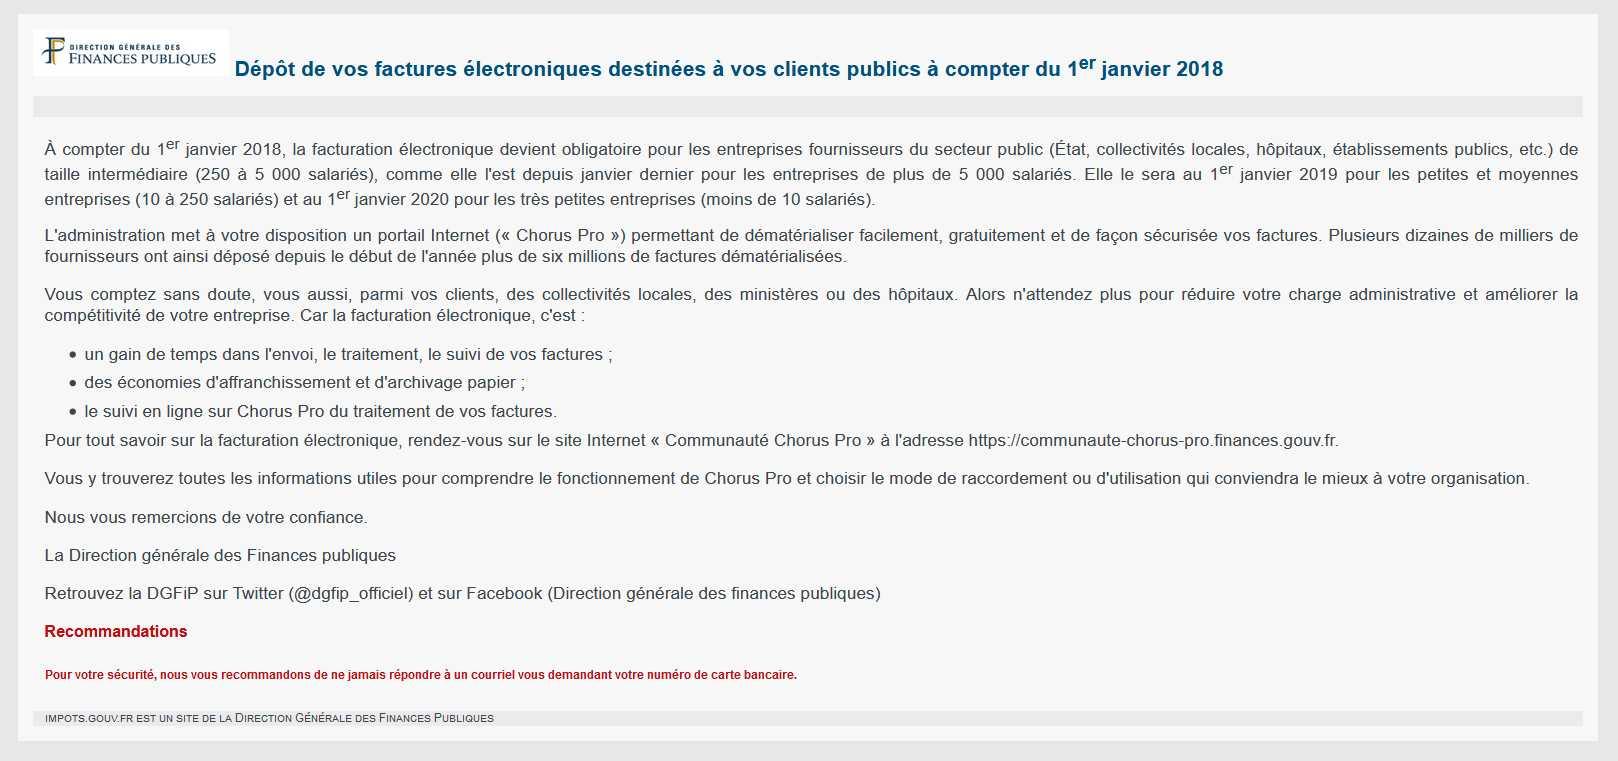 Communaute Chorus Pro Etape 2 Kanada Versicherung